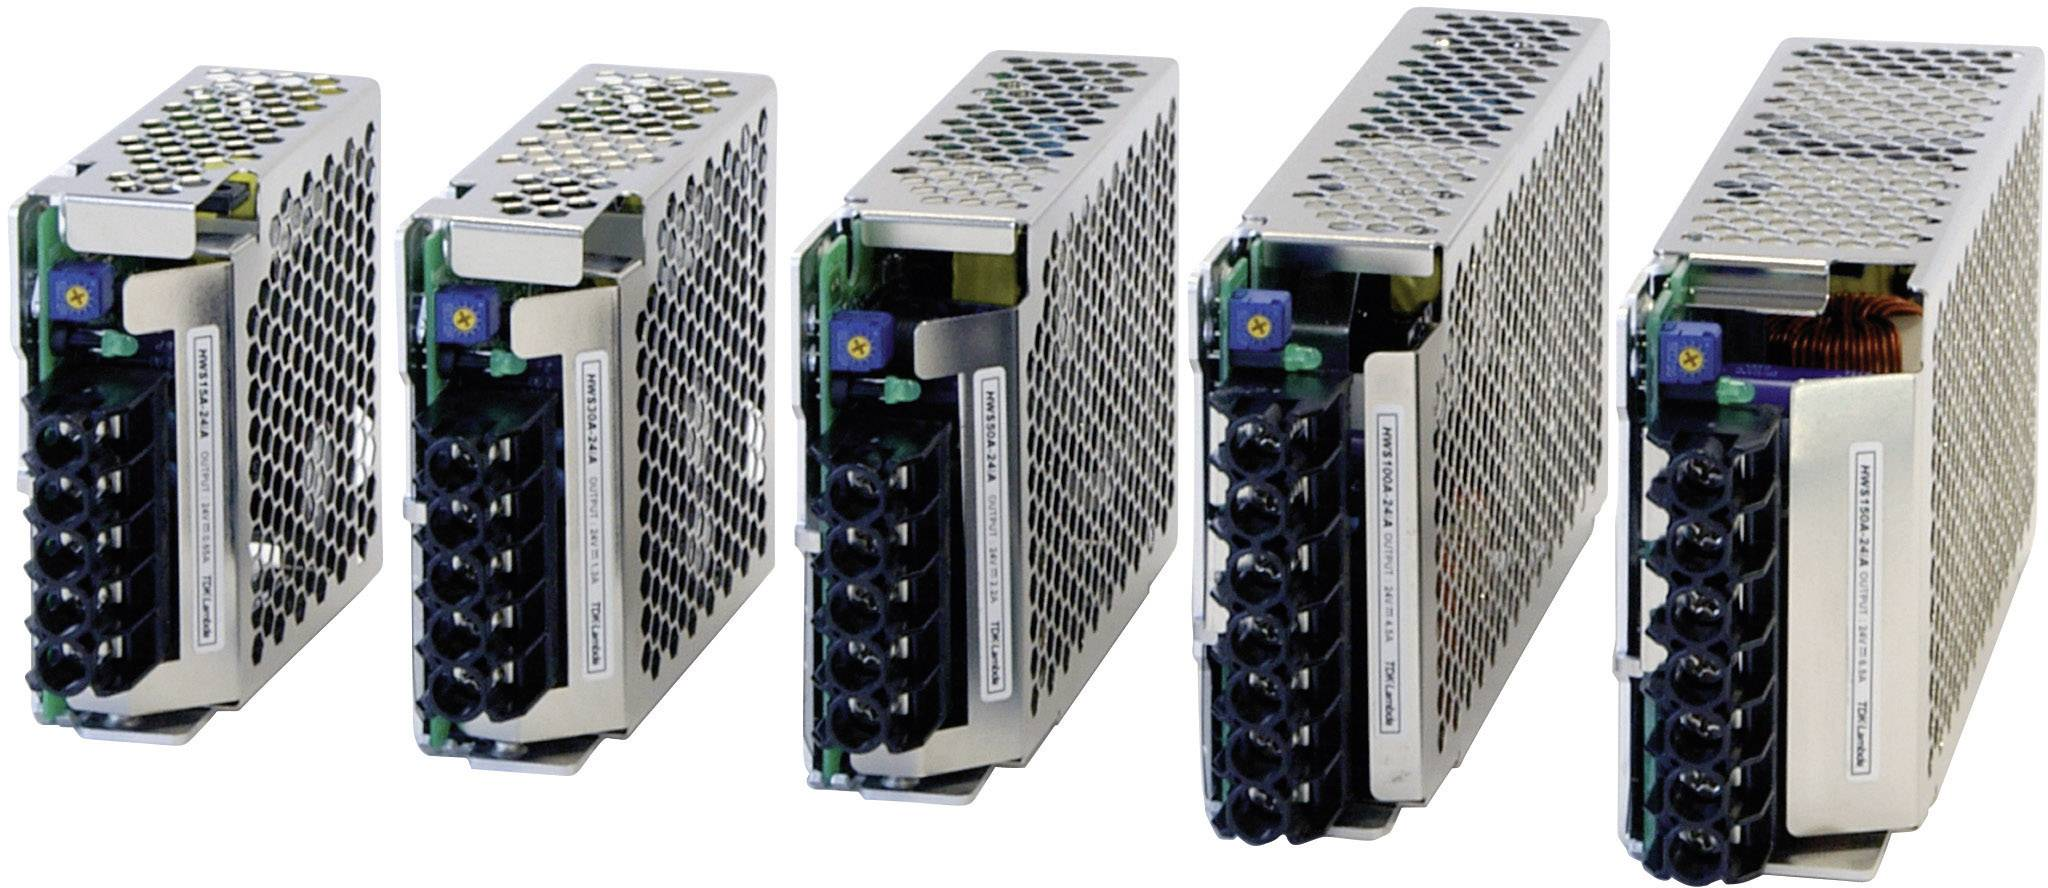 Zabudovateľný napájací zdroj TDK-Lambda HWS-150A-24/A, 24 V, 156 W